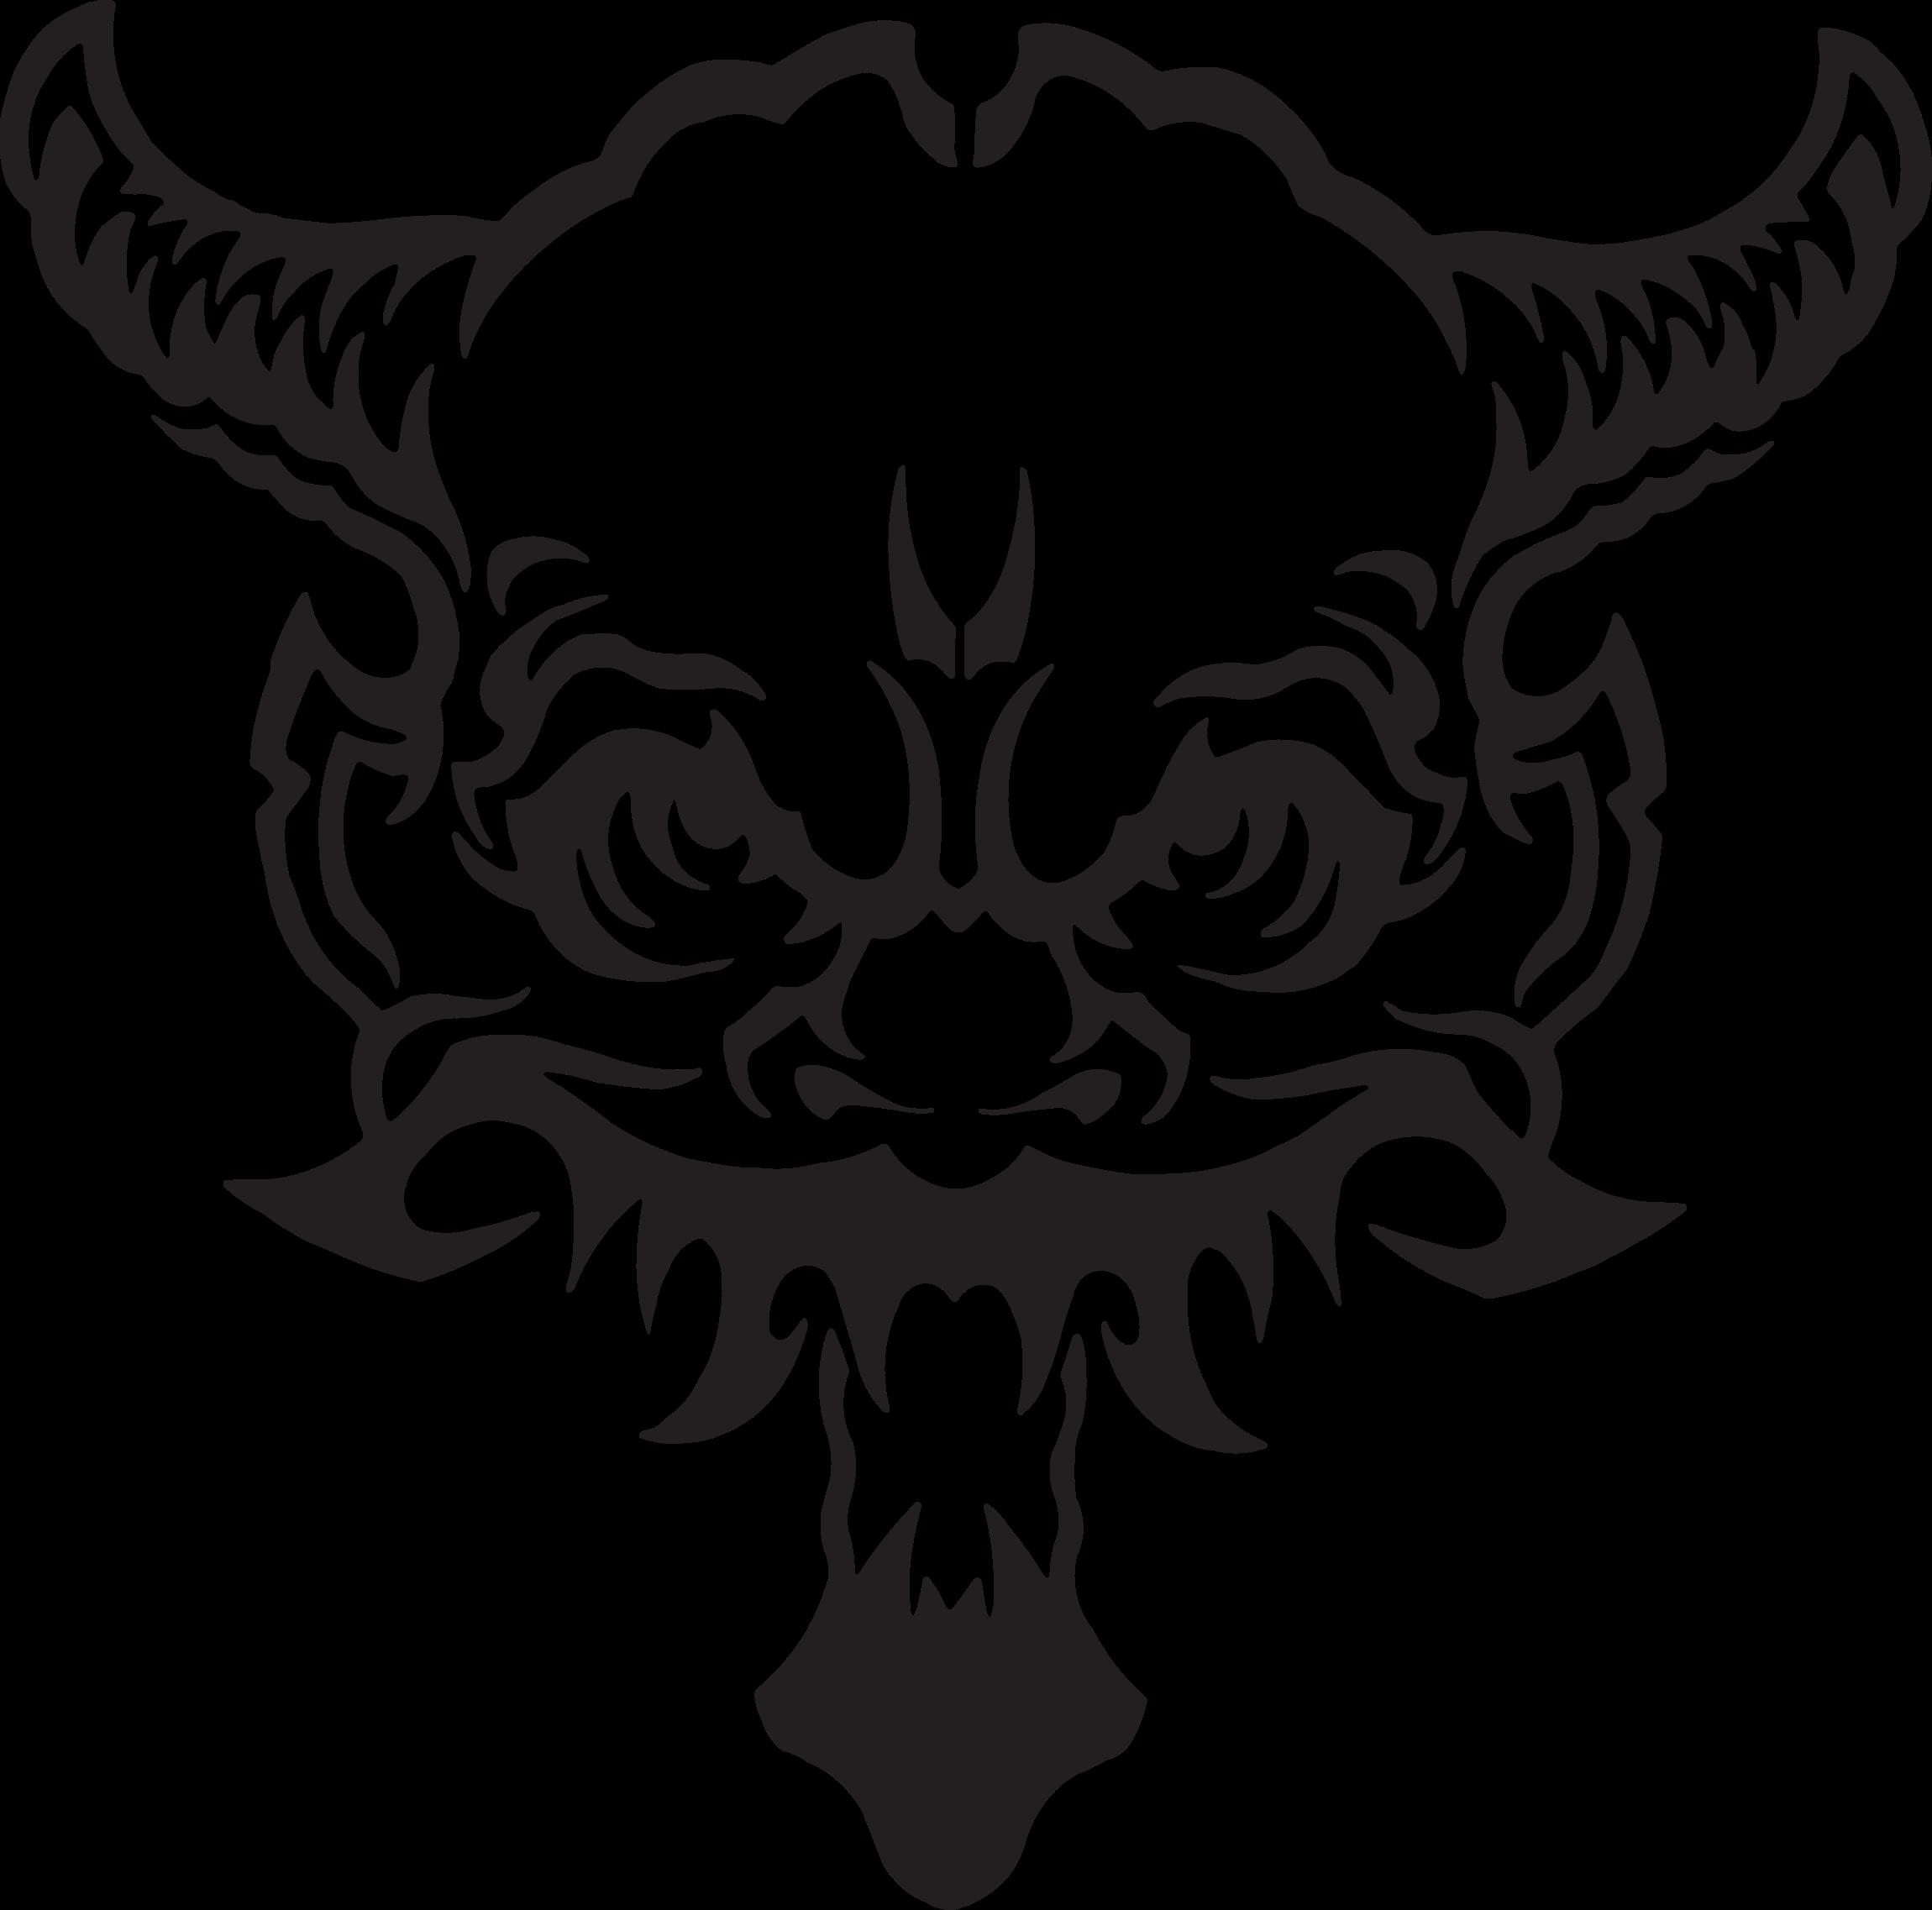 Demon PNG - 15217